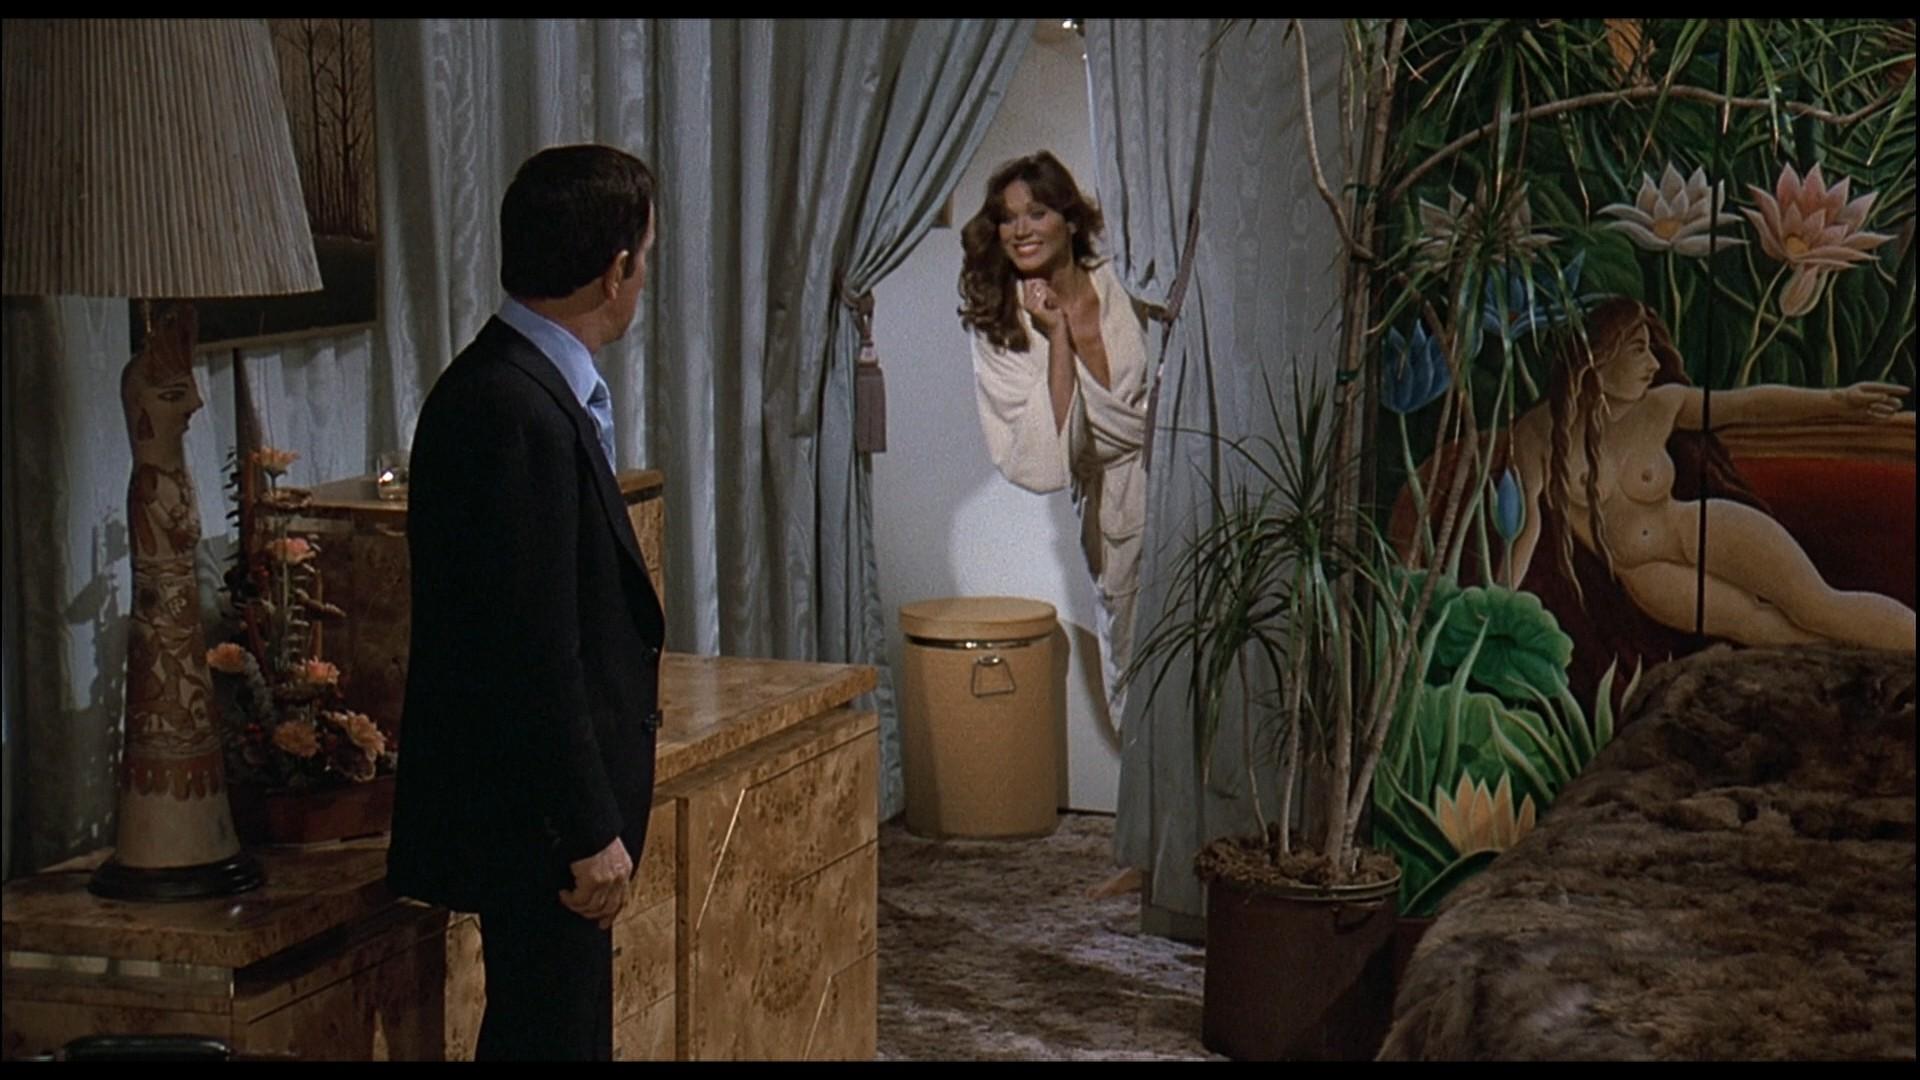 Cheré Bryson busty see through Andrea Howard, Pamela Hensley hot - The Nude Bomb (1980) HD 1080p BluRay (8)